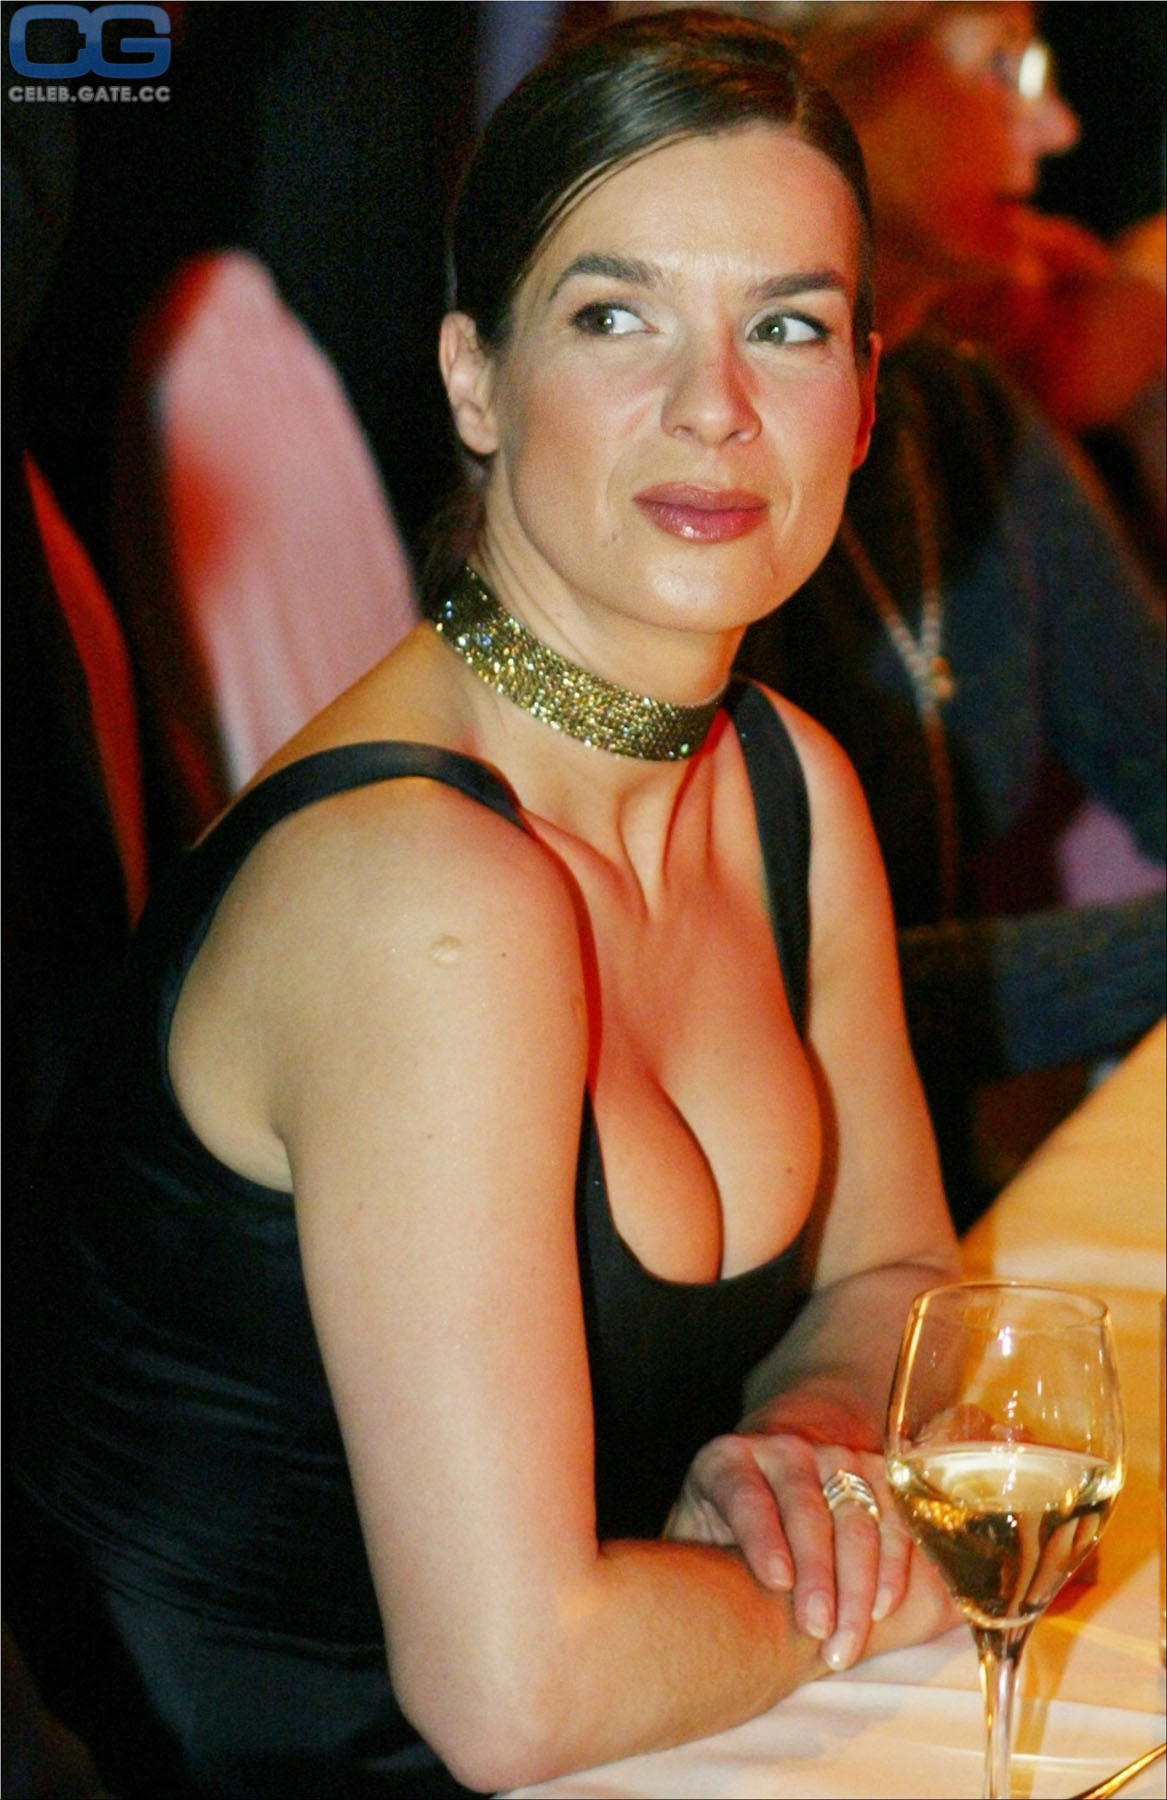 Witt nacktbilder katarina 65 Sexy